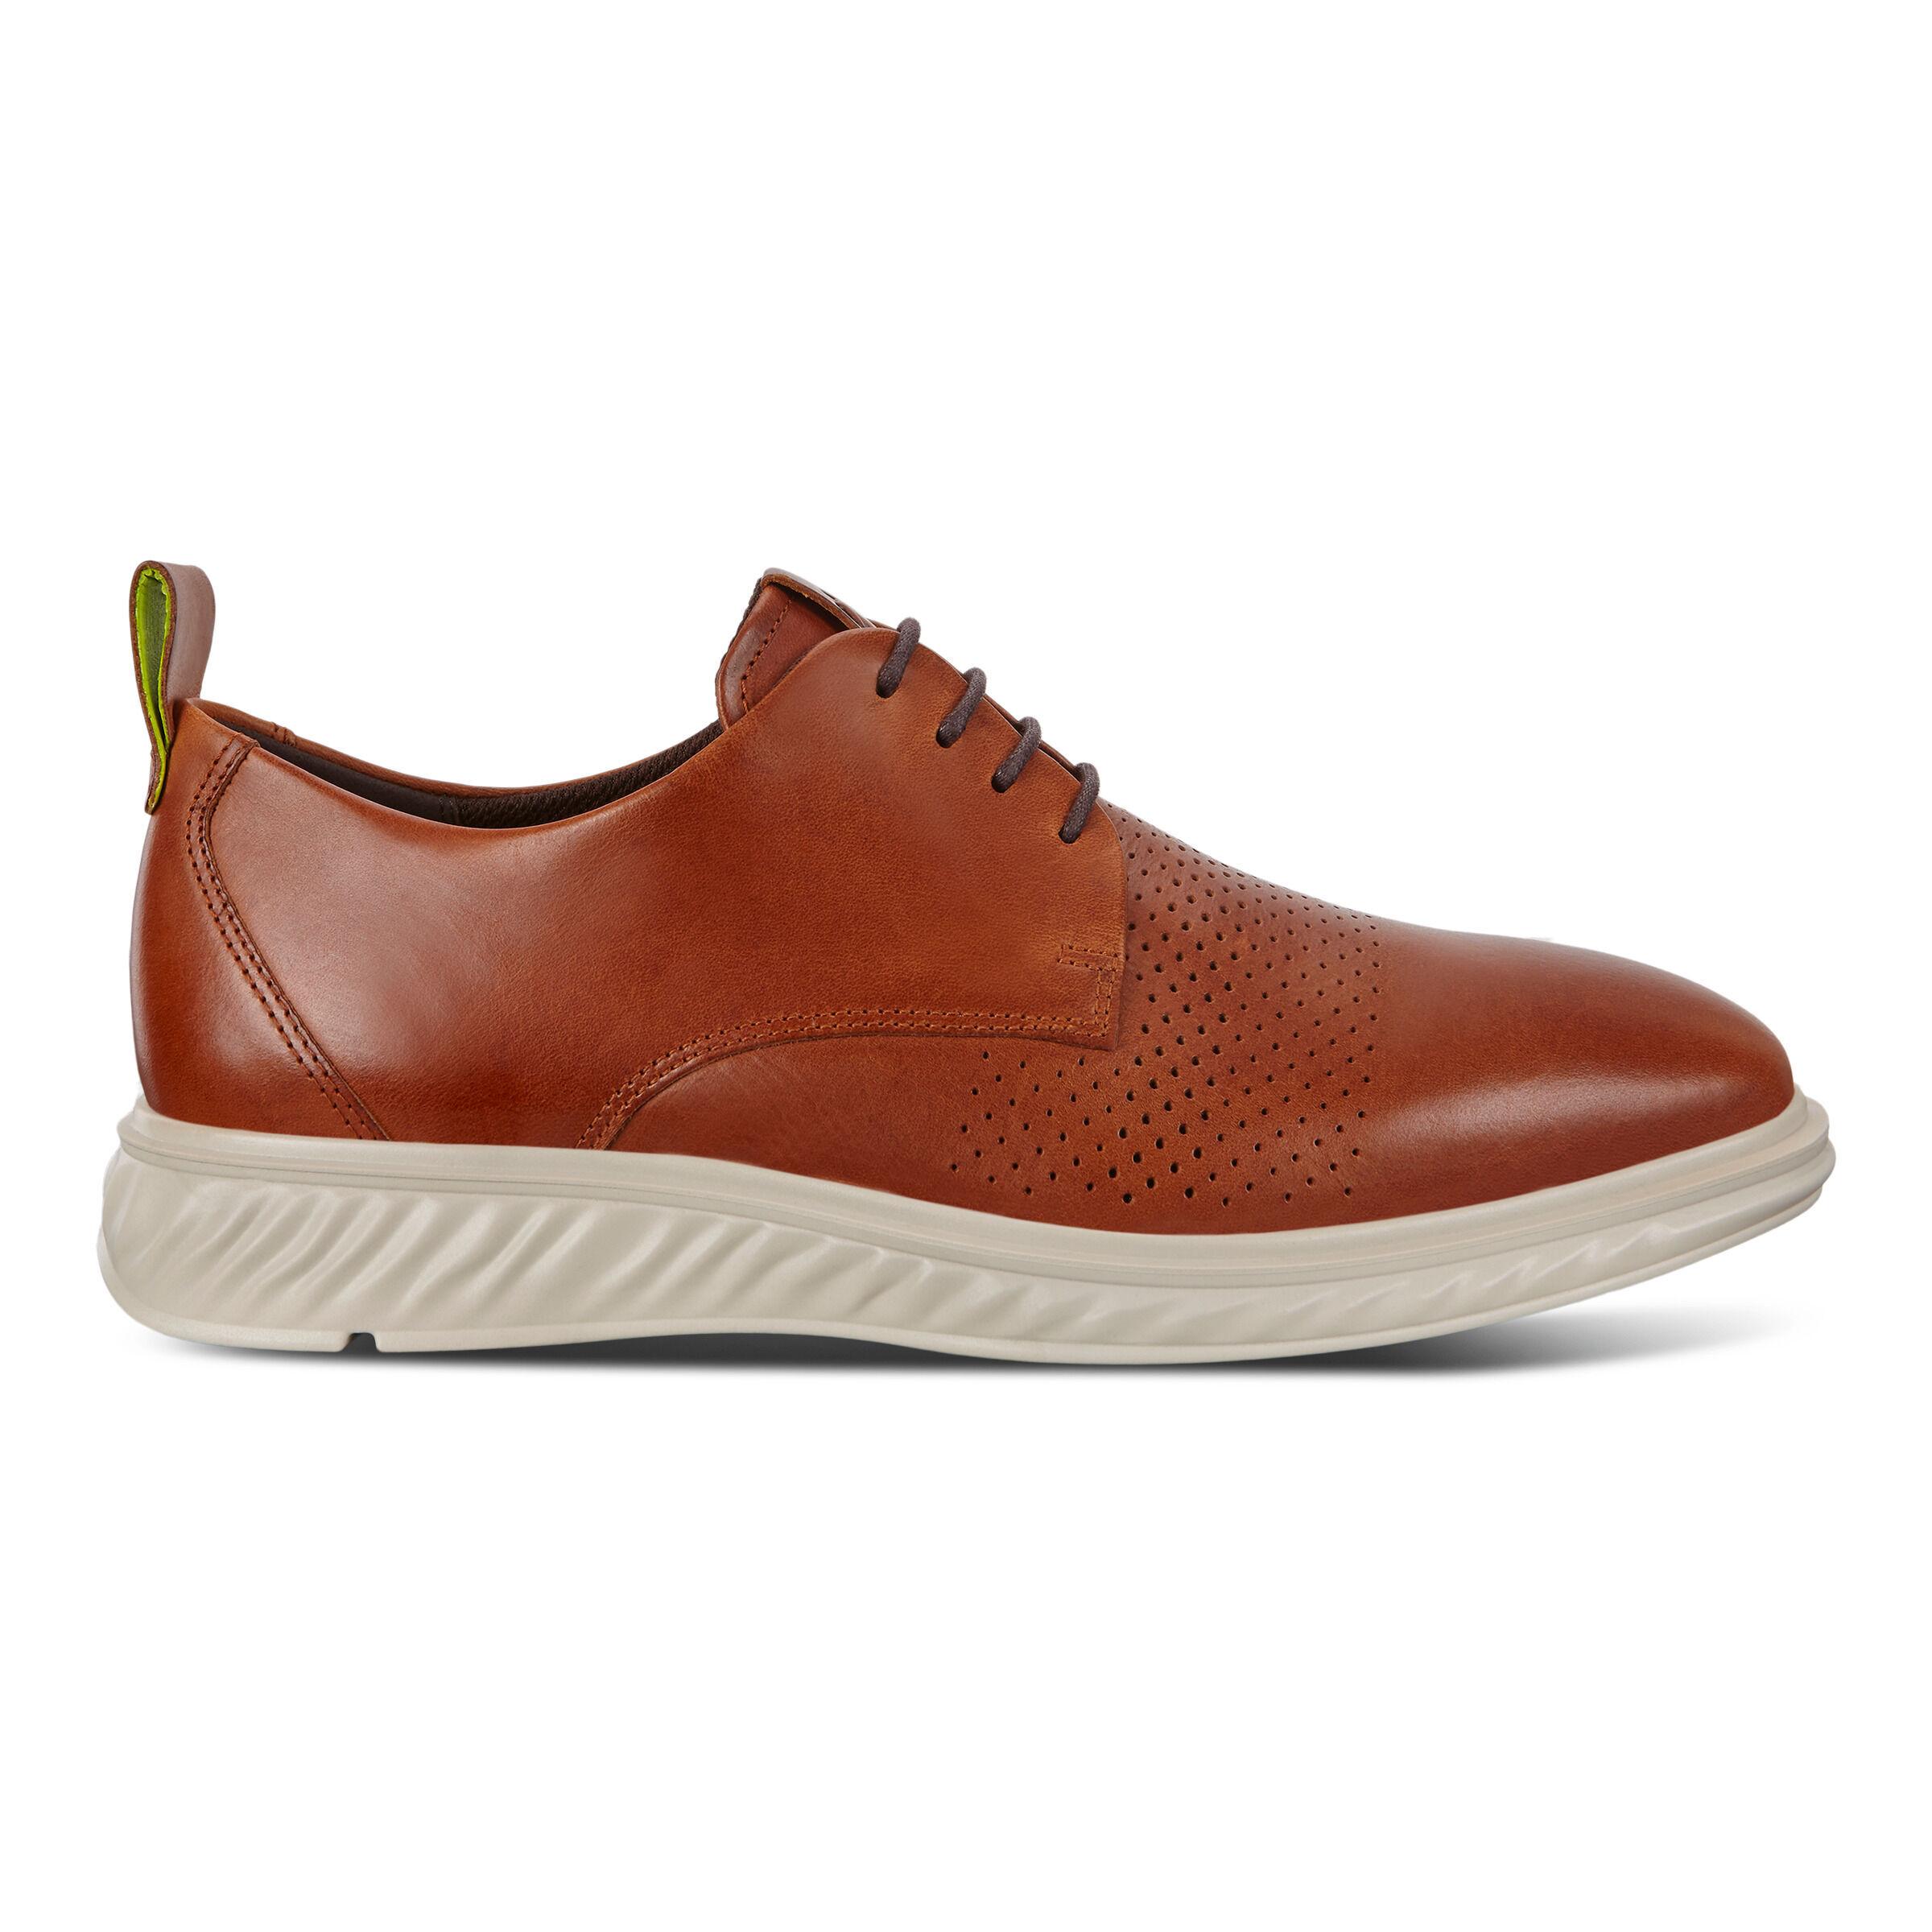 ECCO ST.1 Hybrid Lite Plain-toe Derby Shoes: 5 - Amber